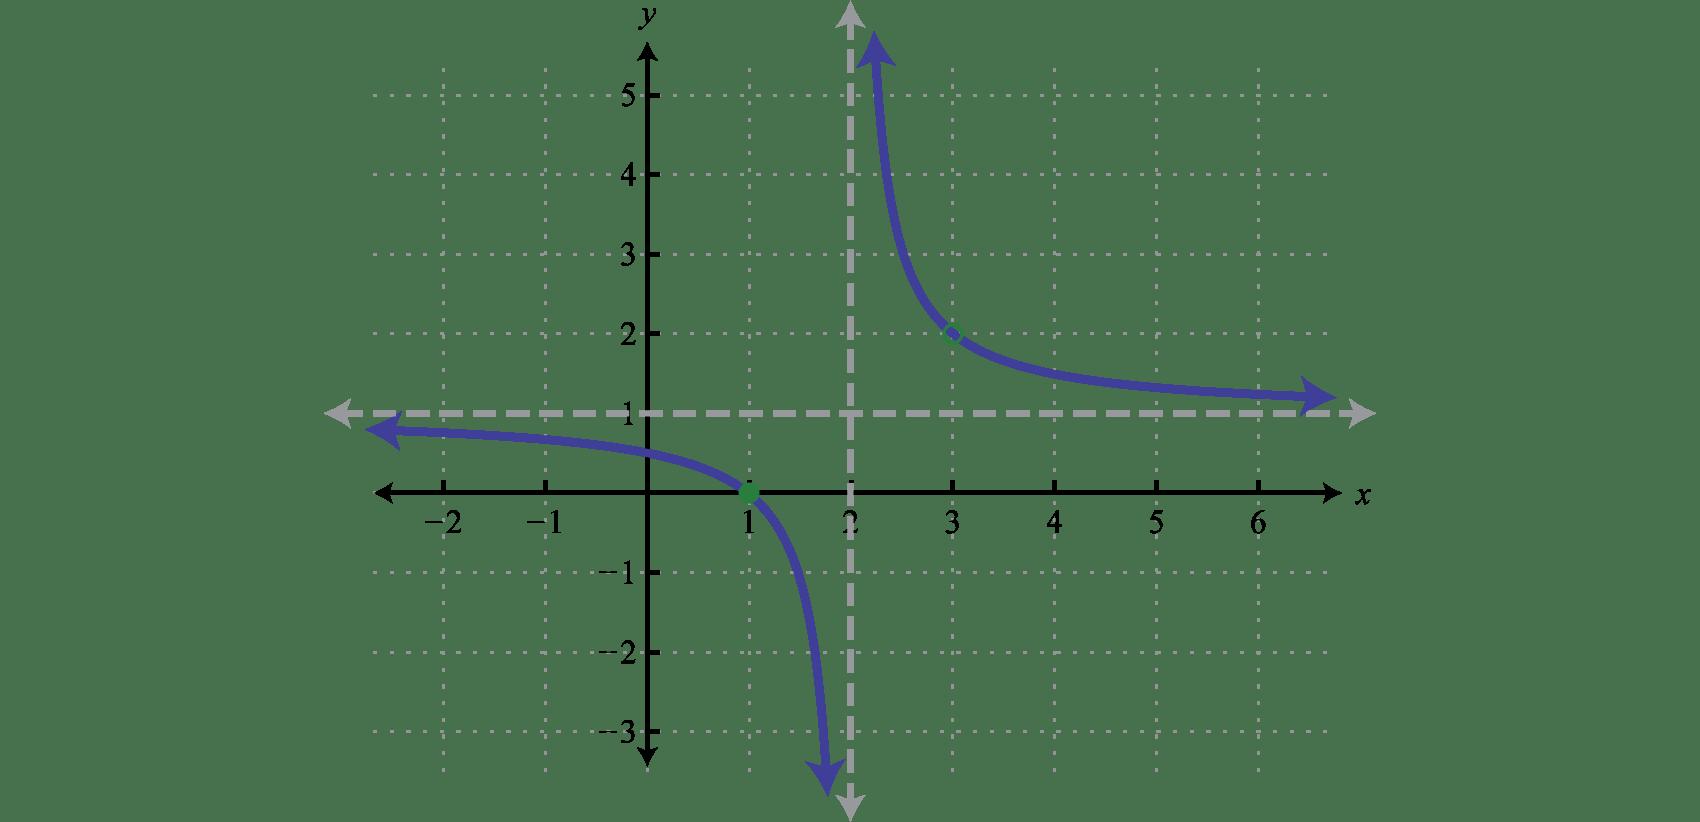 Mfg Algebraic Fractions